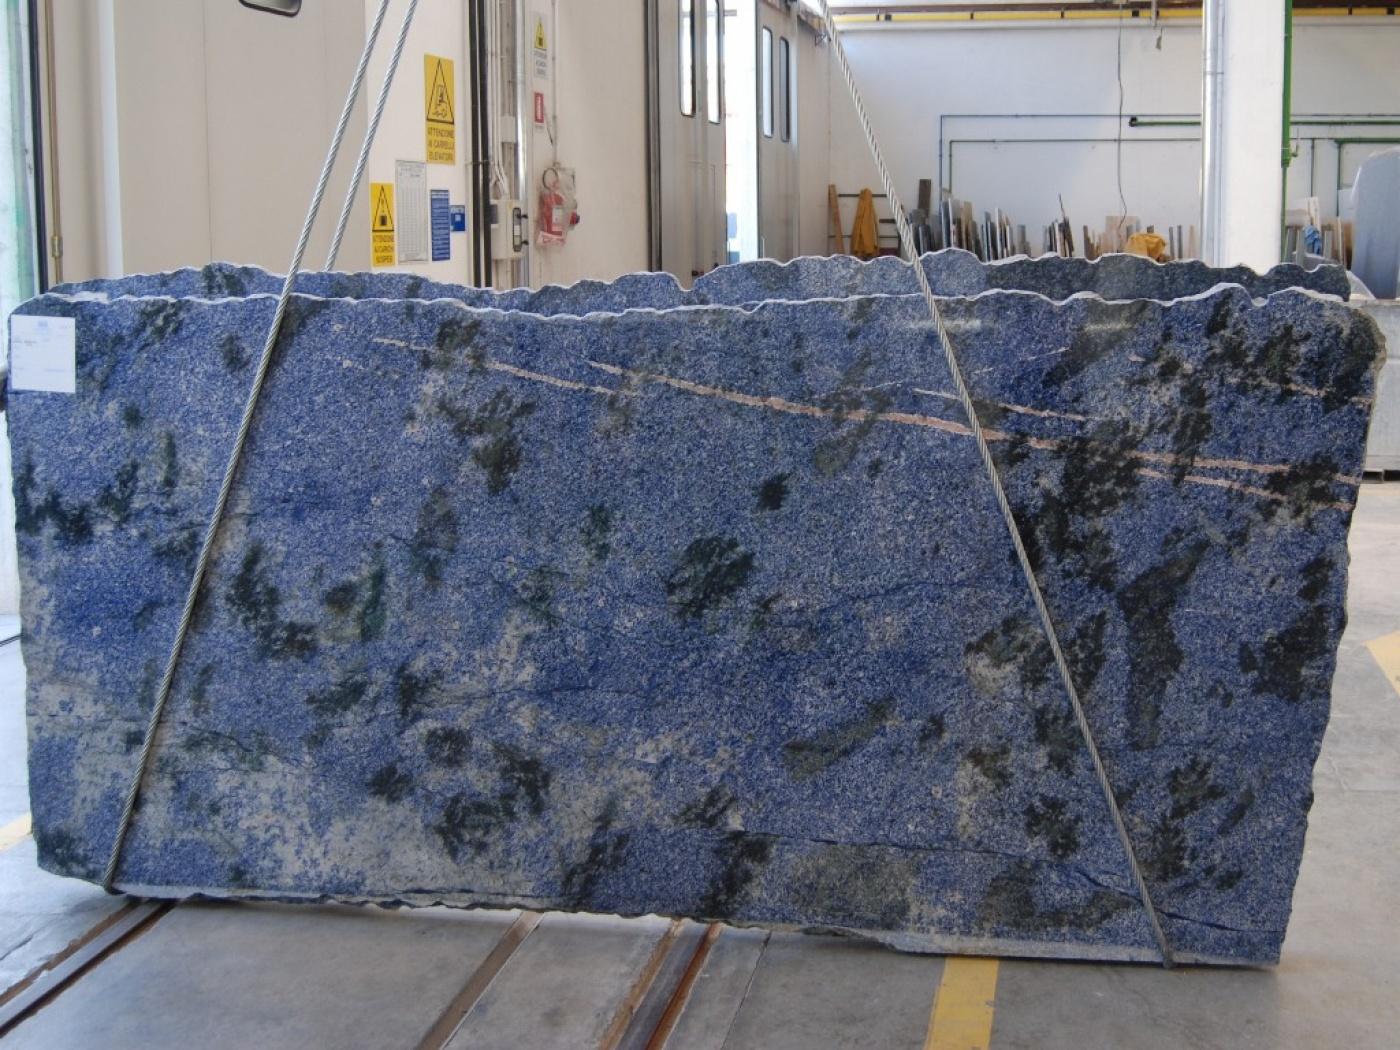 Plan De Travail Granit Loire azul bahia bleu bahia - marbrerie de la crau: pierre, marbre